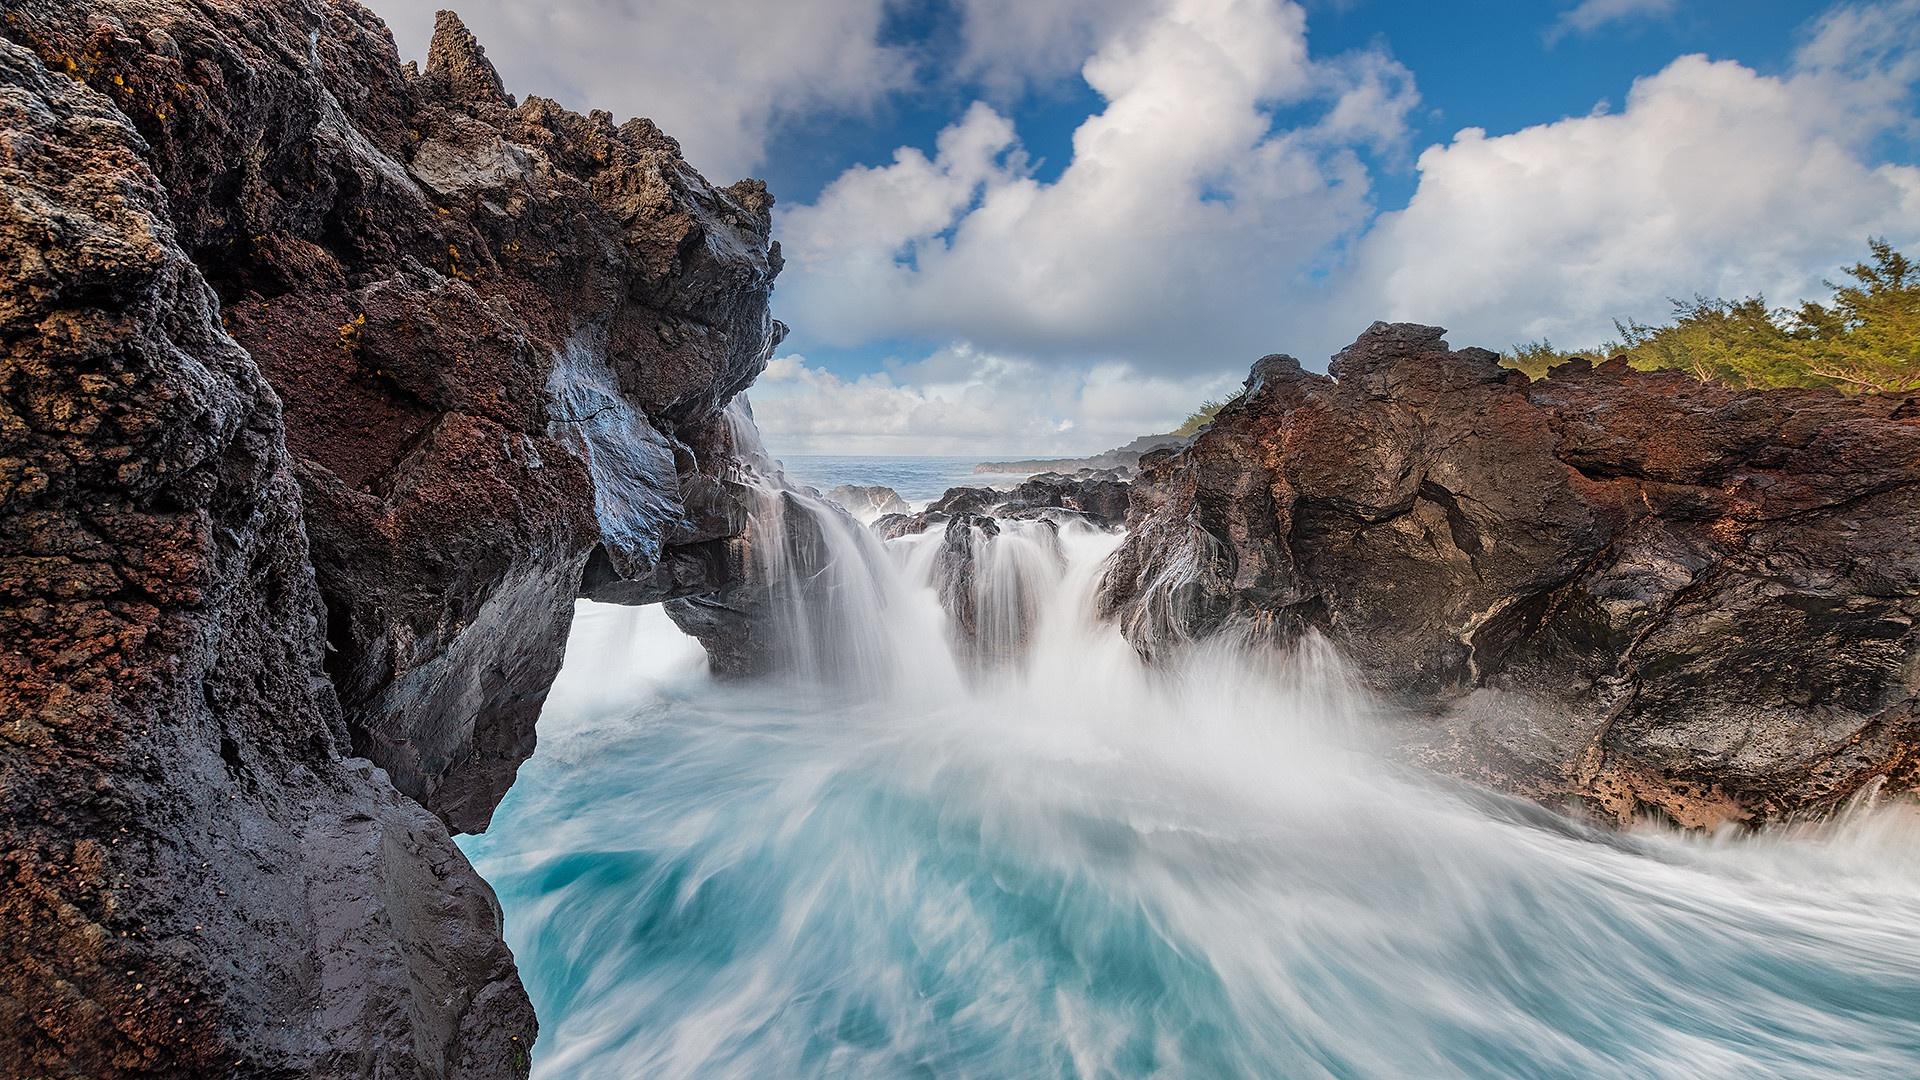 General 1920x1080 Indian Ocean coast water rock nature La Reunion Island